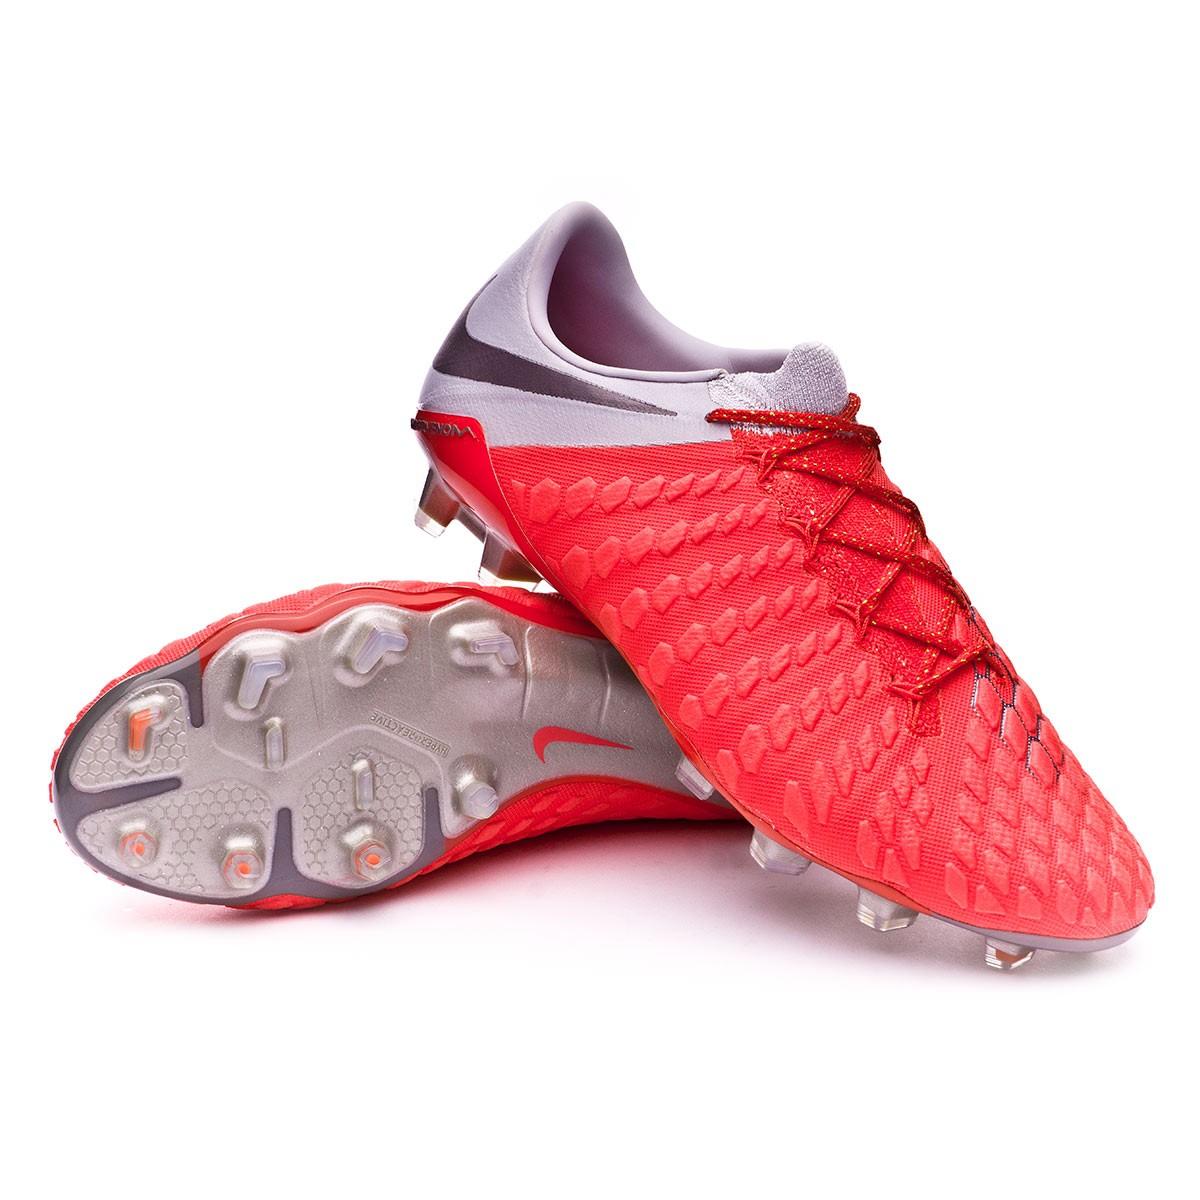 ec4725028de Nike Hypervenom Phantom III Elite FG Football Boots. Light crimson-Metallic  dark grey-Wolf ...